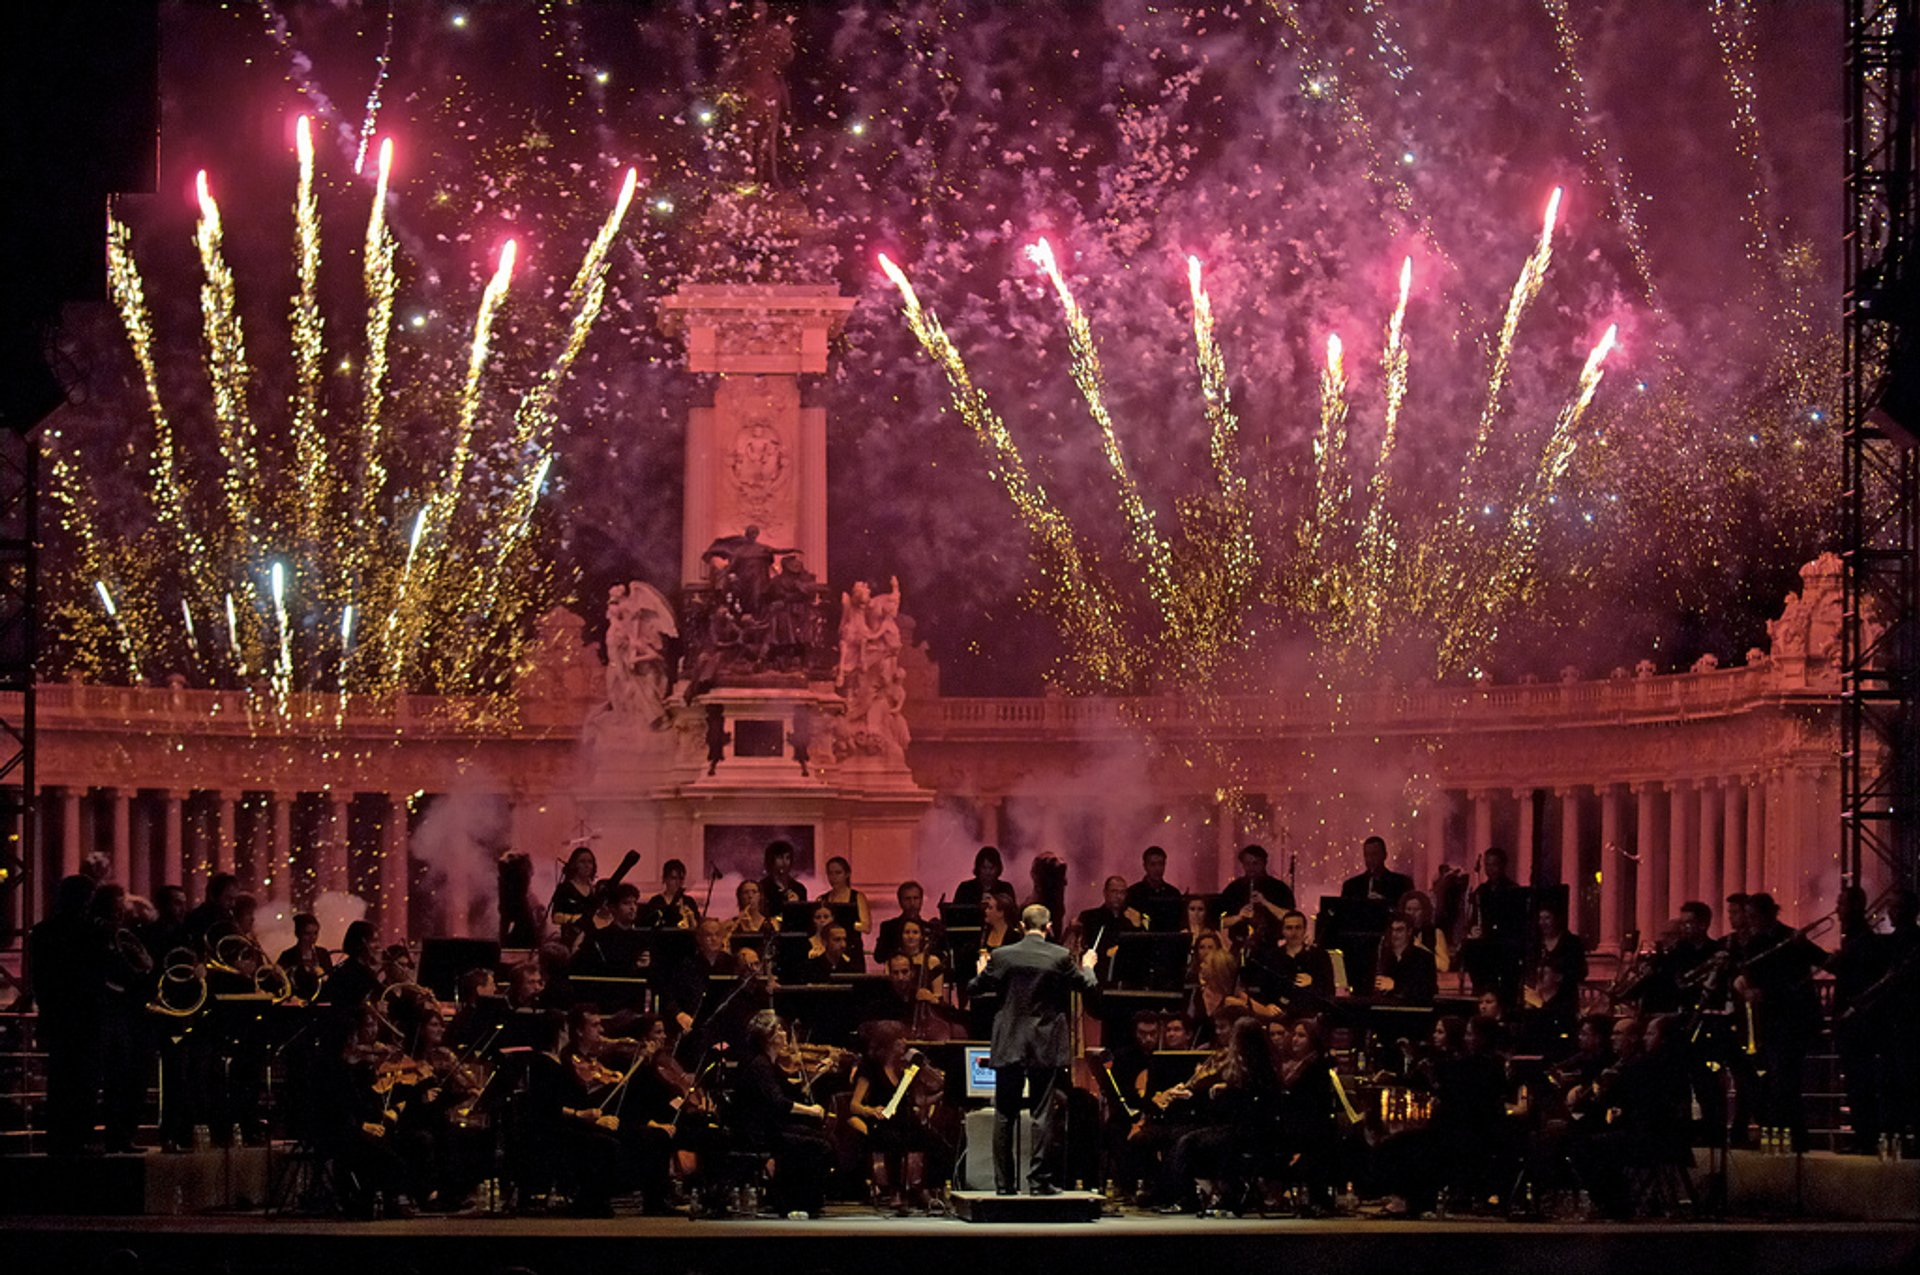 San Isidro Concert at Retiro Park 2019